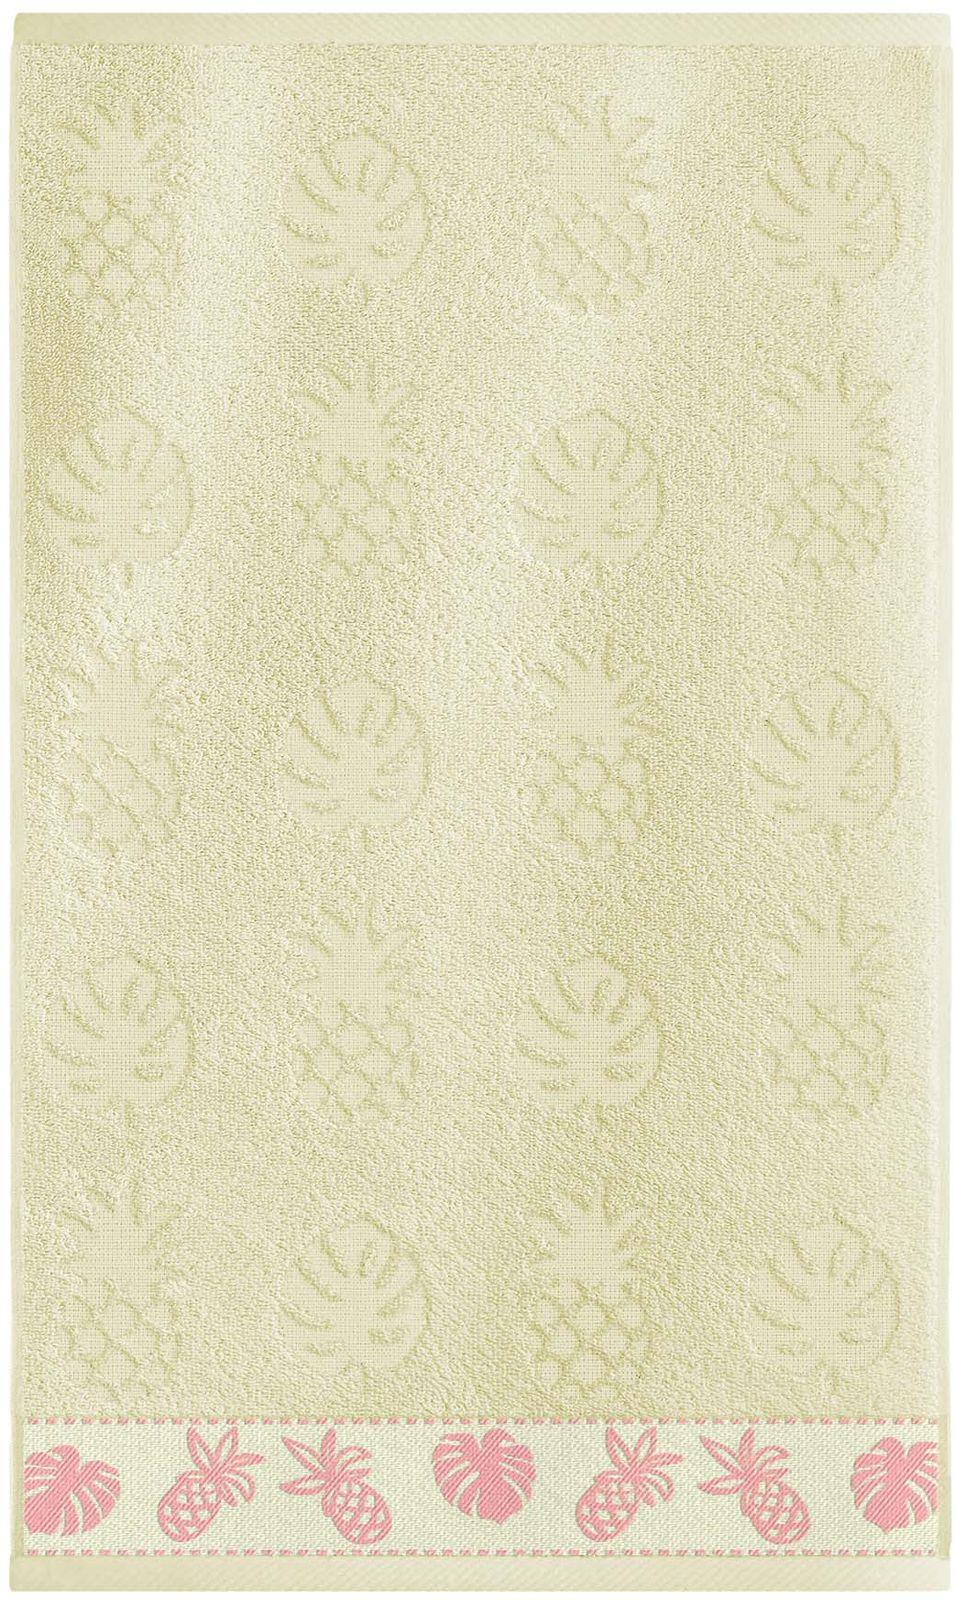 Полотенце банное Sole Mio Ананас, ваниль, 35 х 55 см